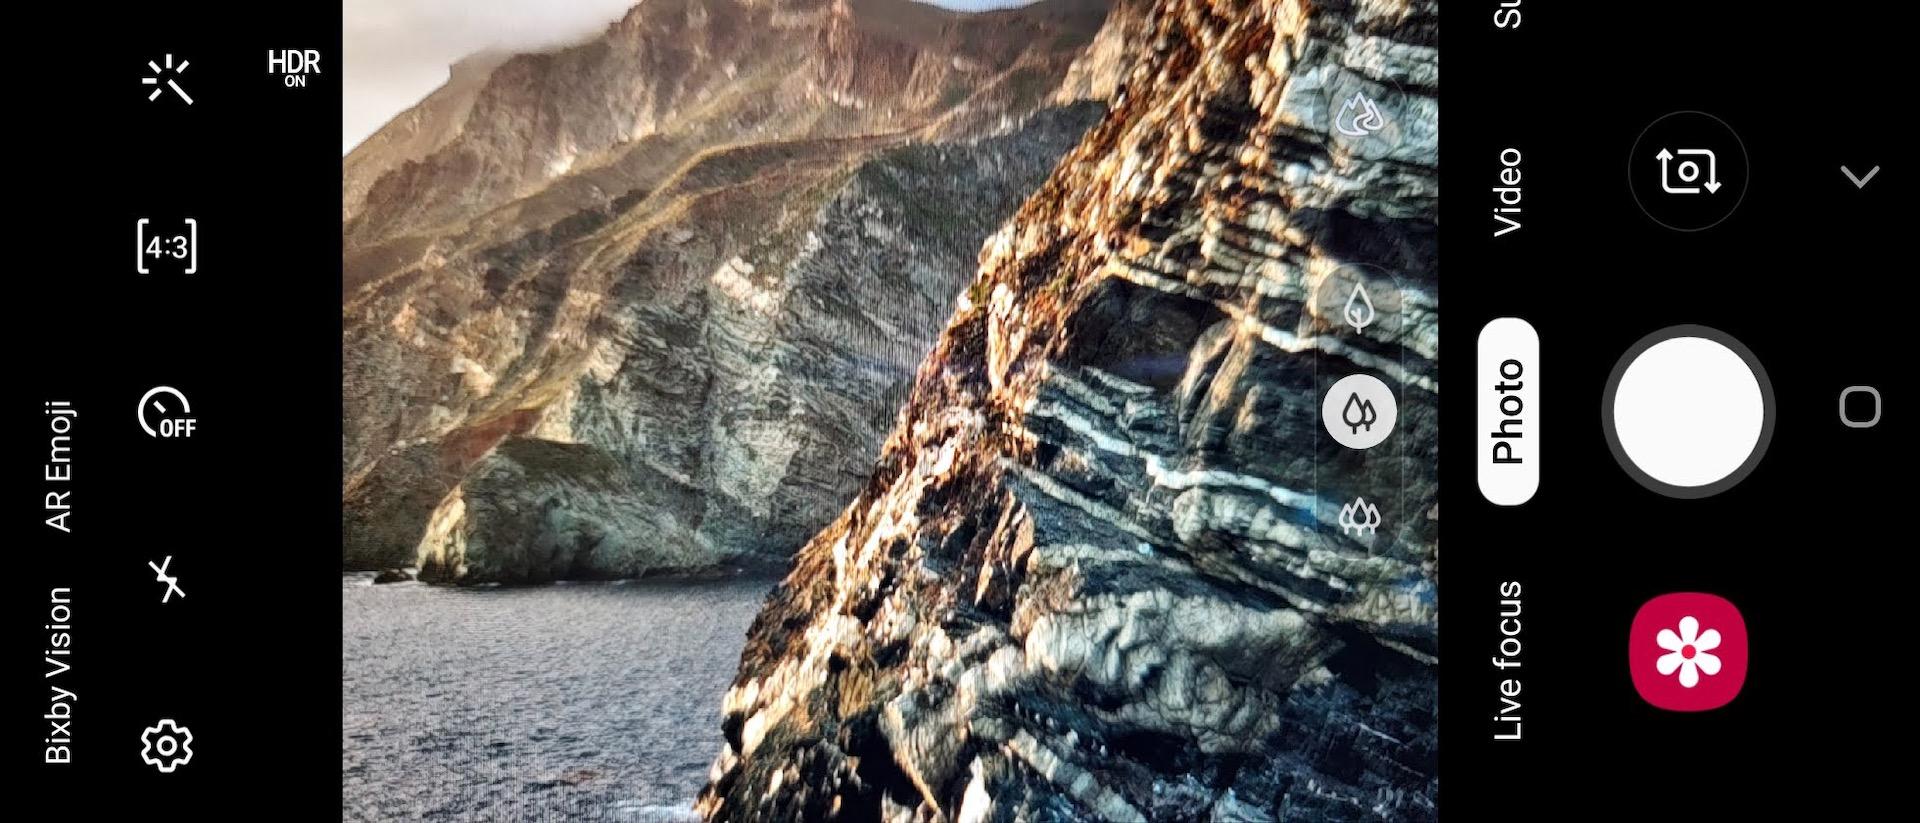 Samsung Galaxy Fold review cover display camera photo